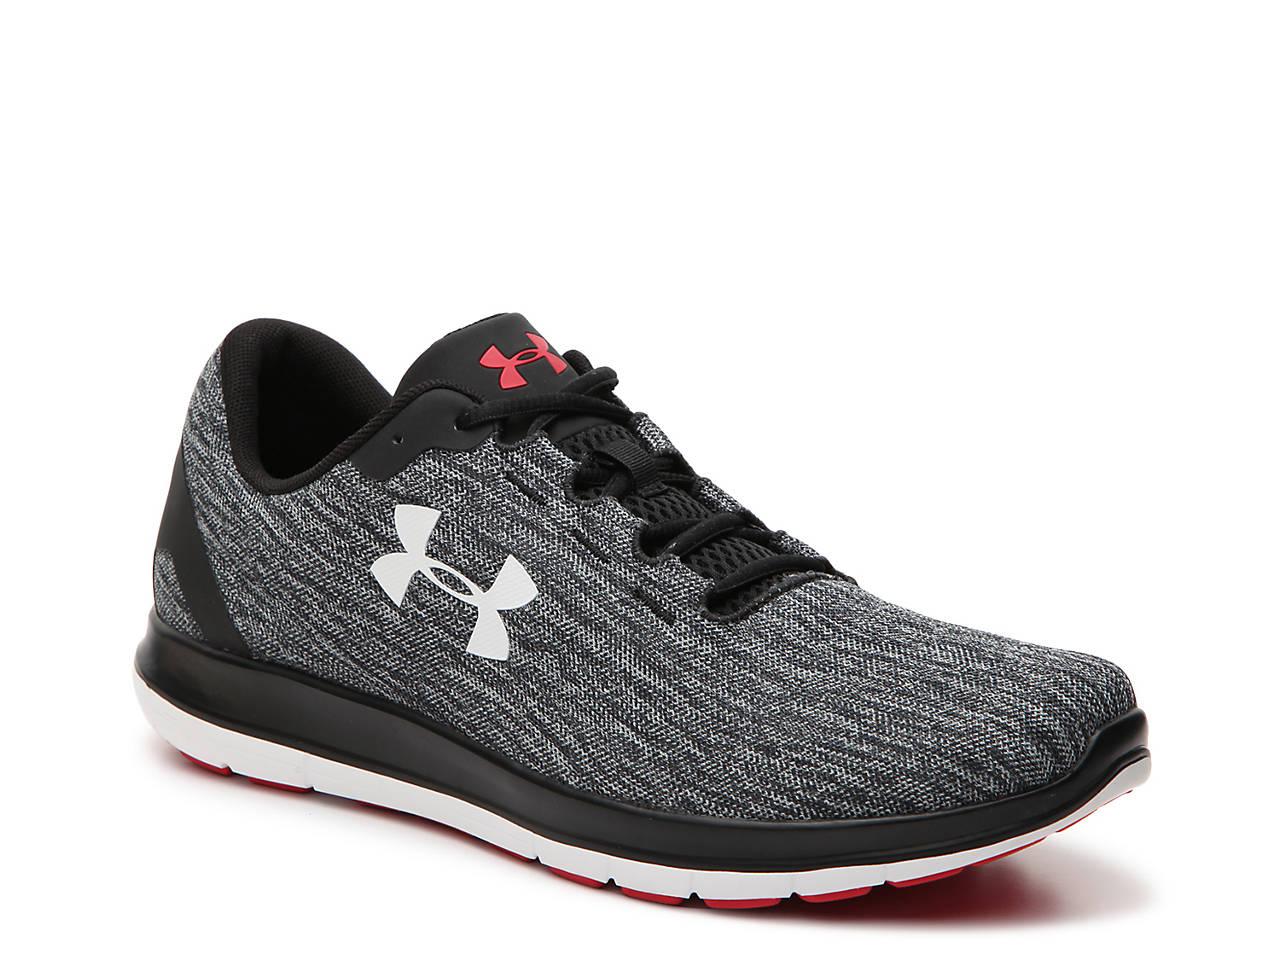 269b1dcf971ae Under Armour Remix Lightweight Running Shoe - Men s Men s Shoes